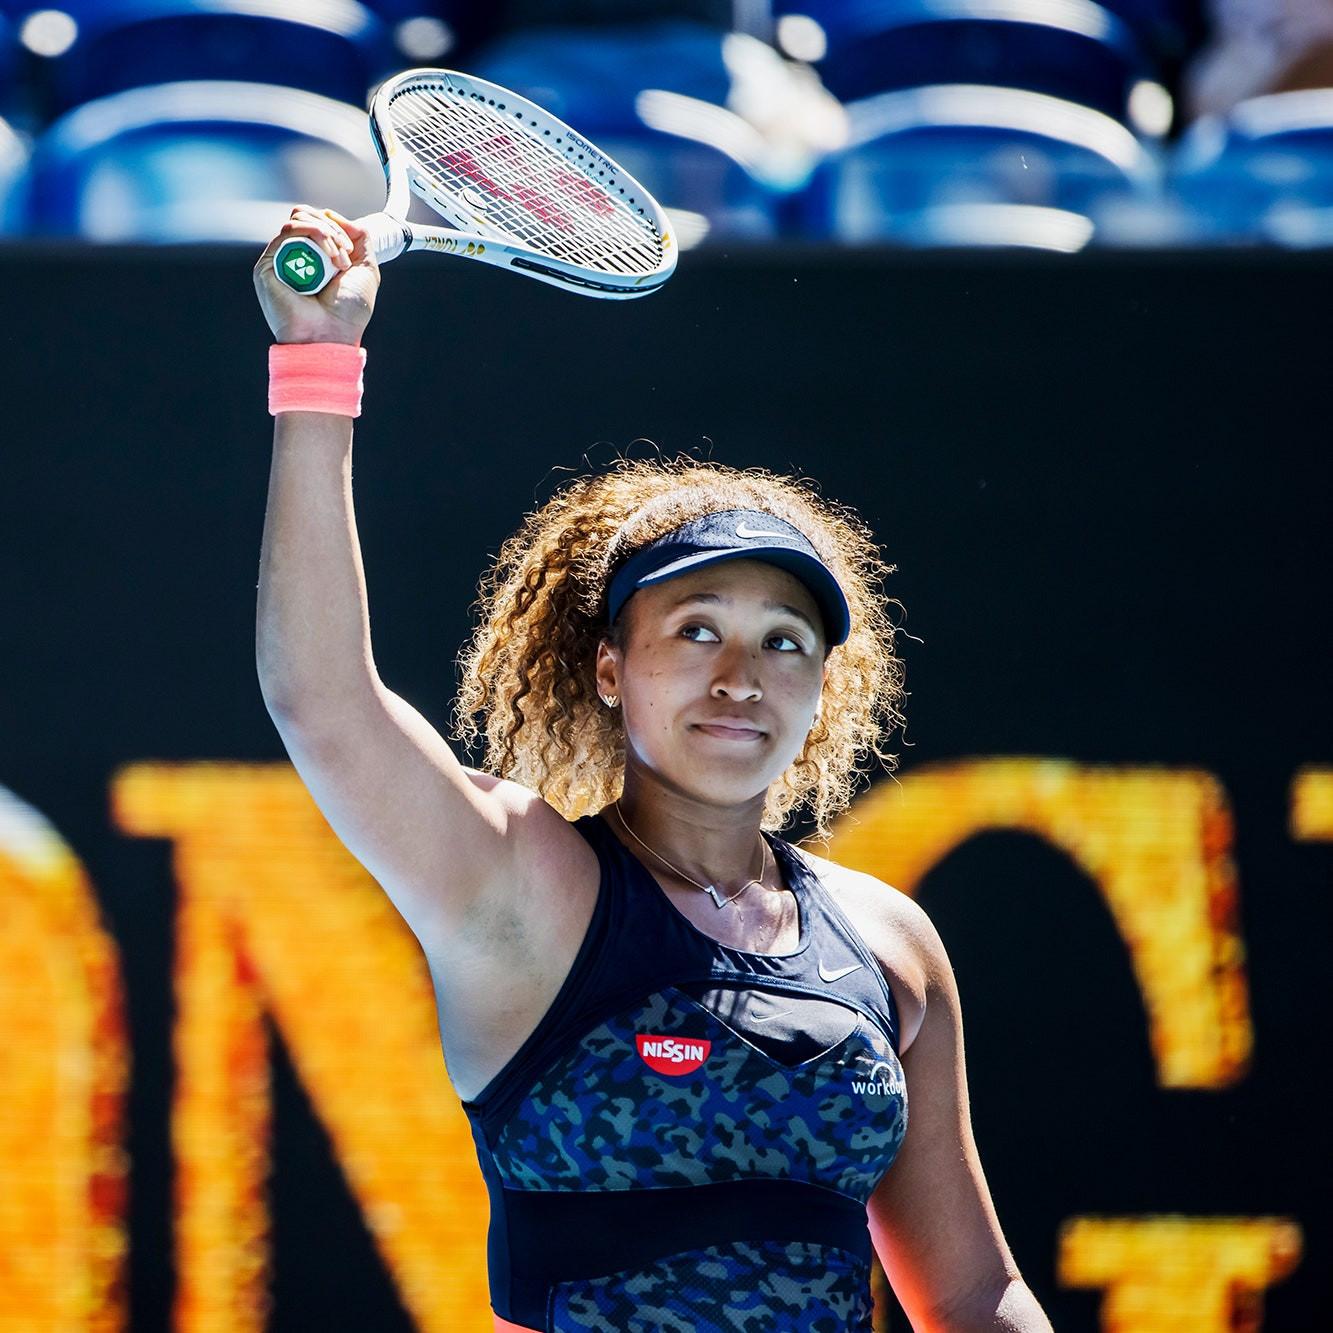 Naomi Osaka pulls out of Wimbledon but plans to return for Tokyo Olympics. 45